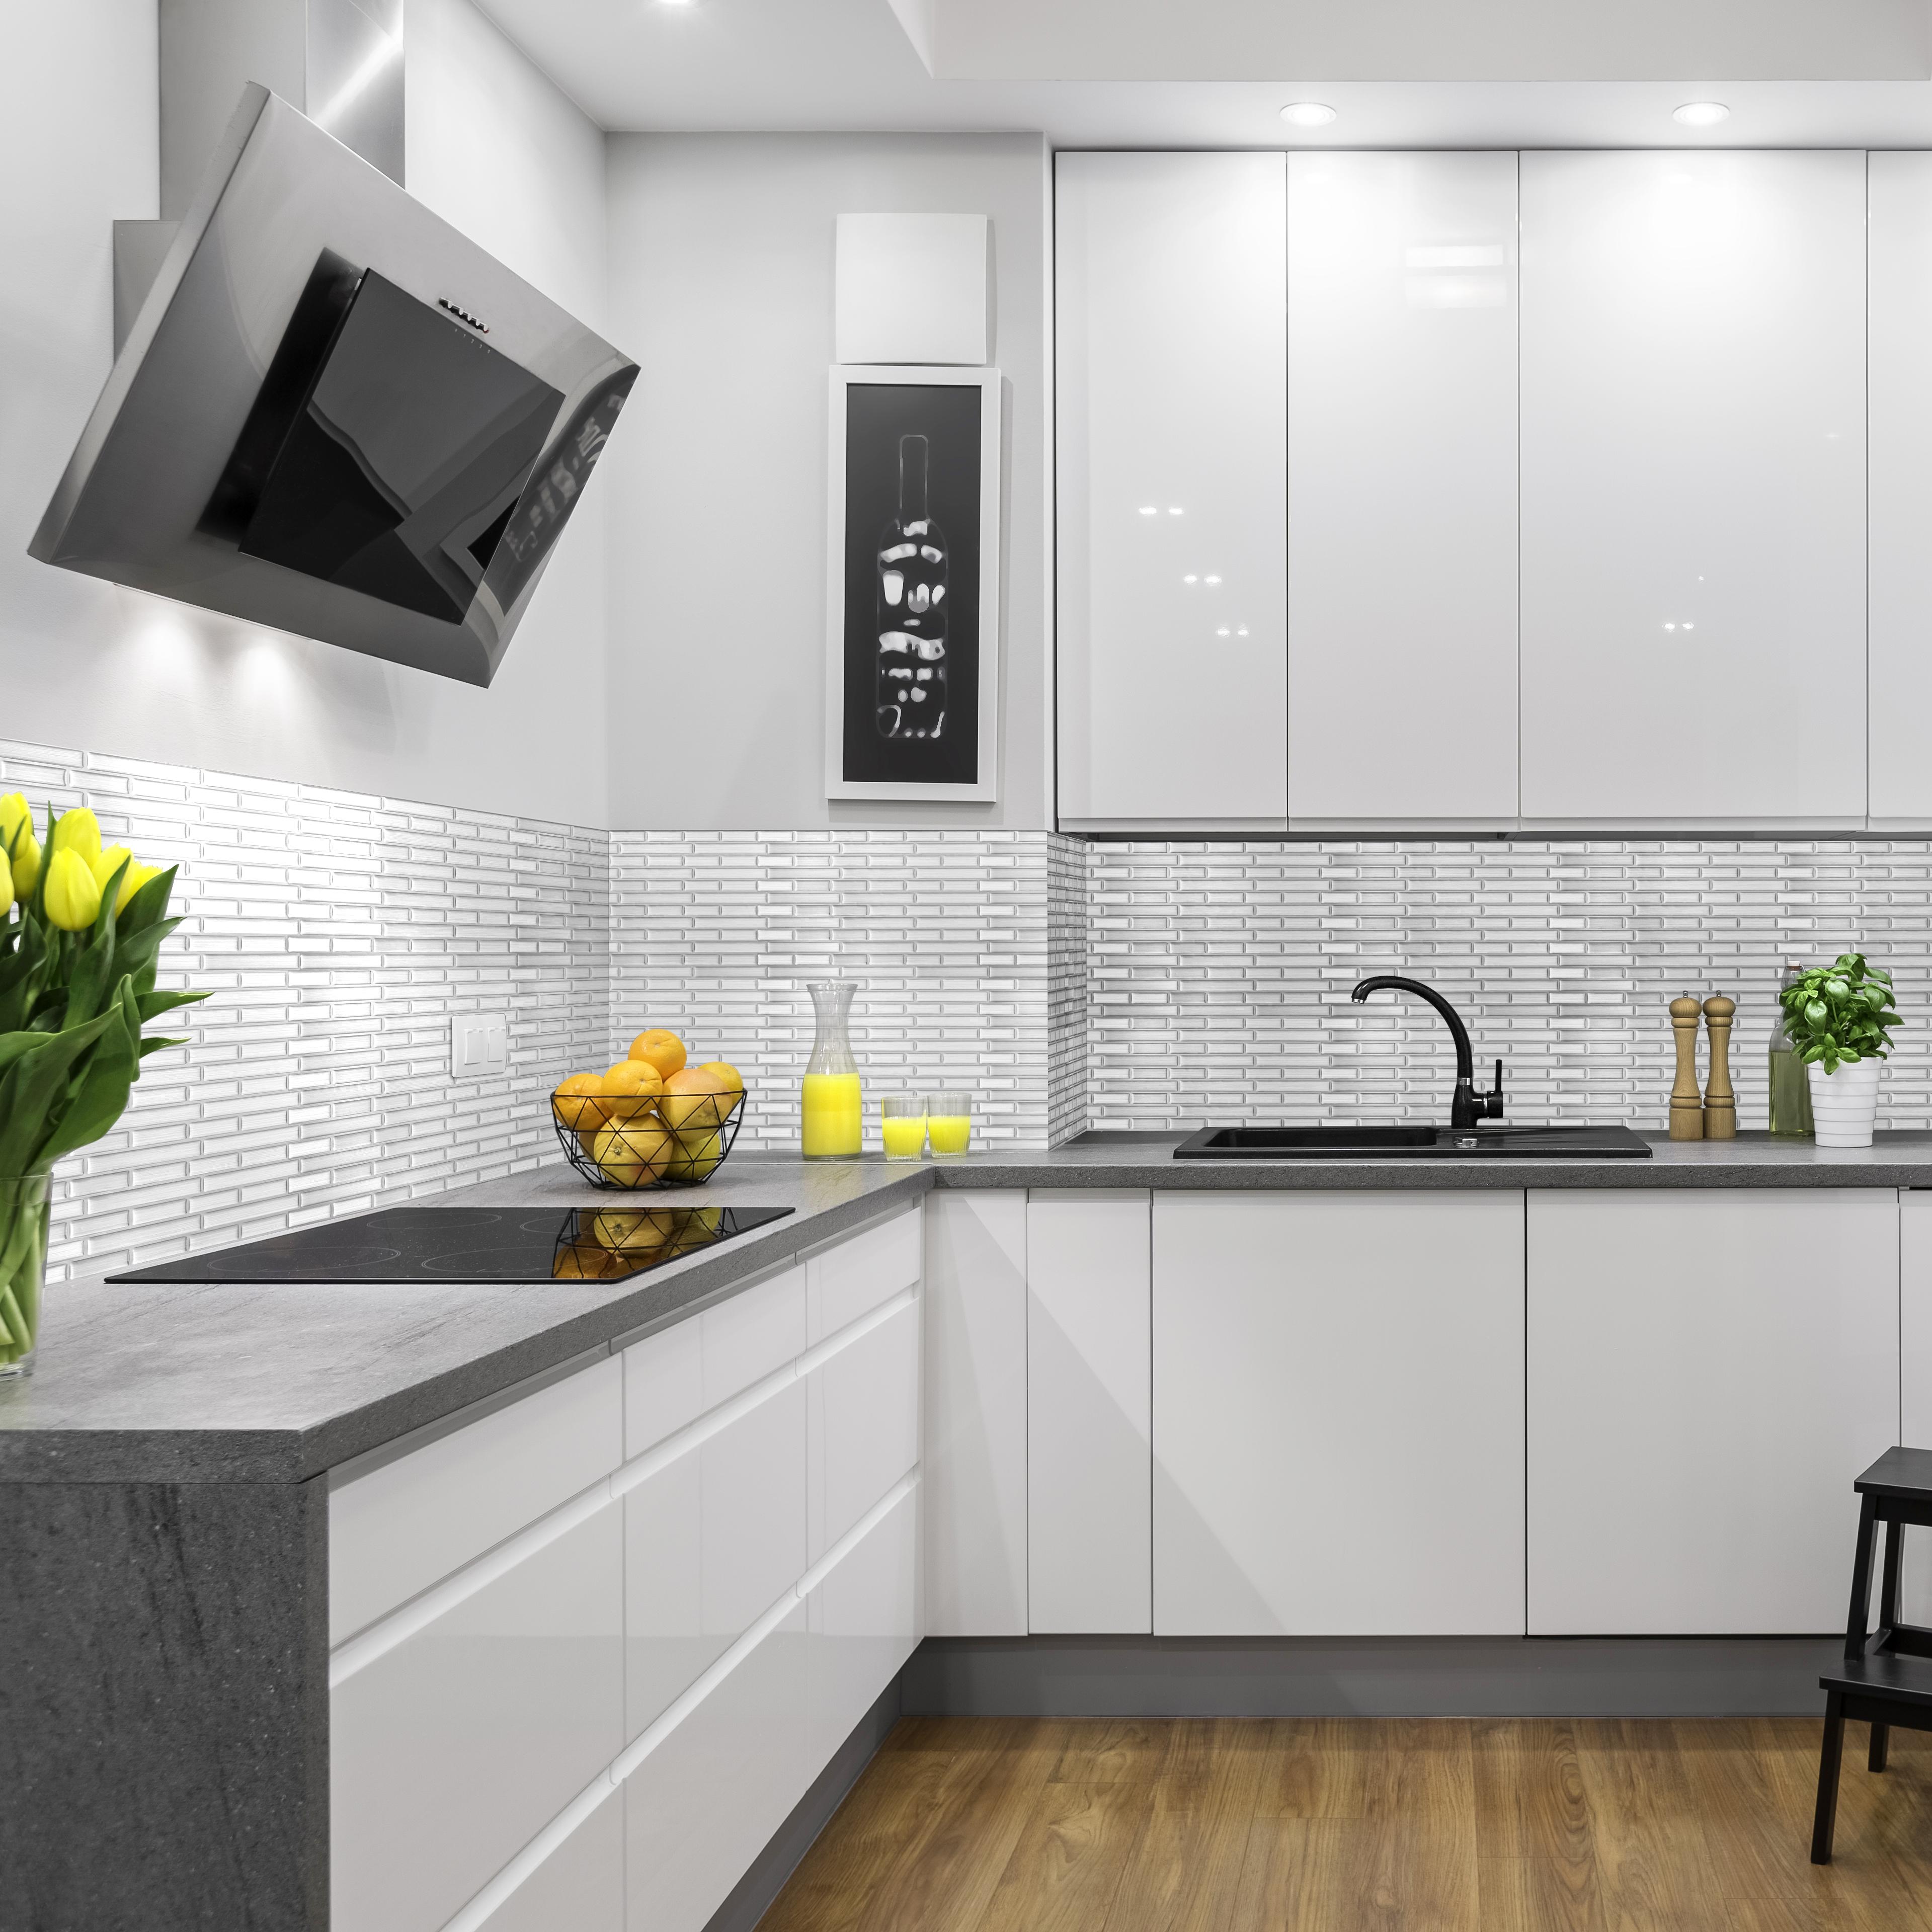 3d Tiles For Kitchen Walls Rumah Joglo Limasan Work